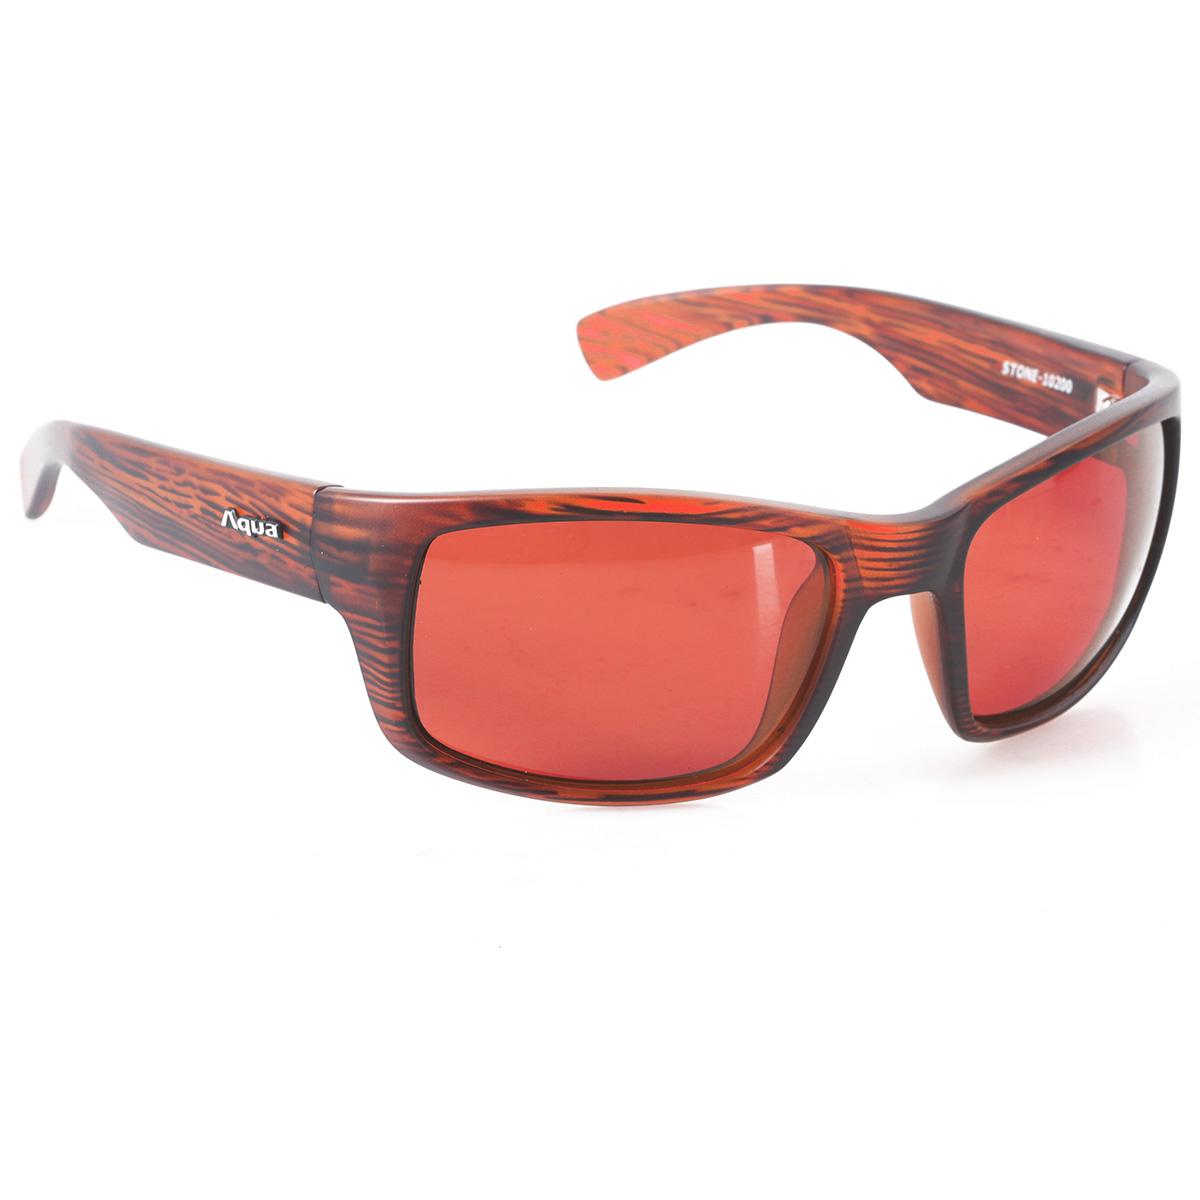 Aqua Stone Demi Brown - (Fishing Polarized Sunglasses)   eBay